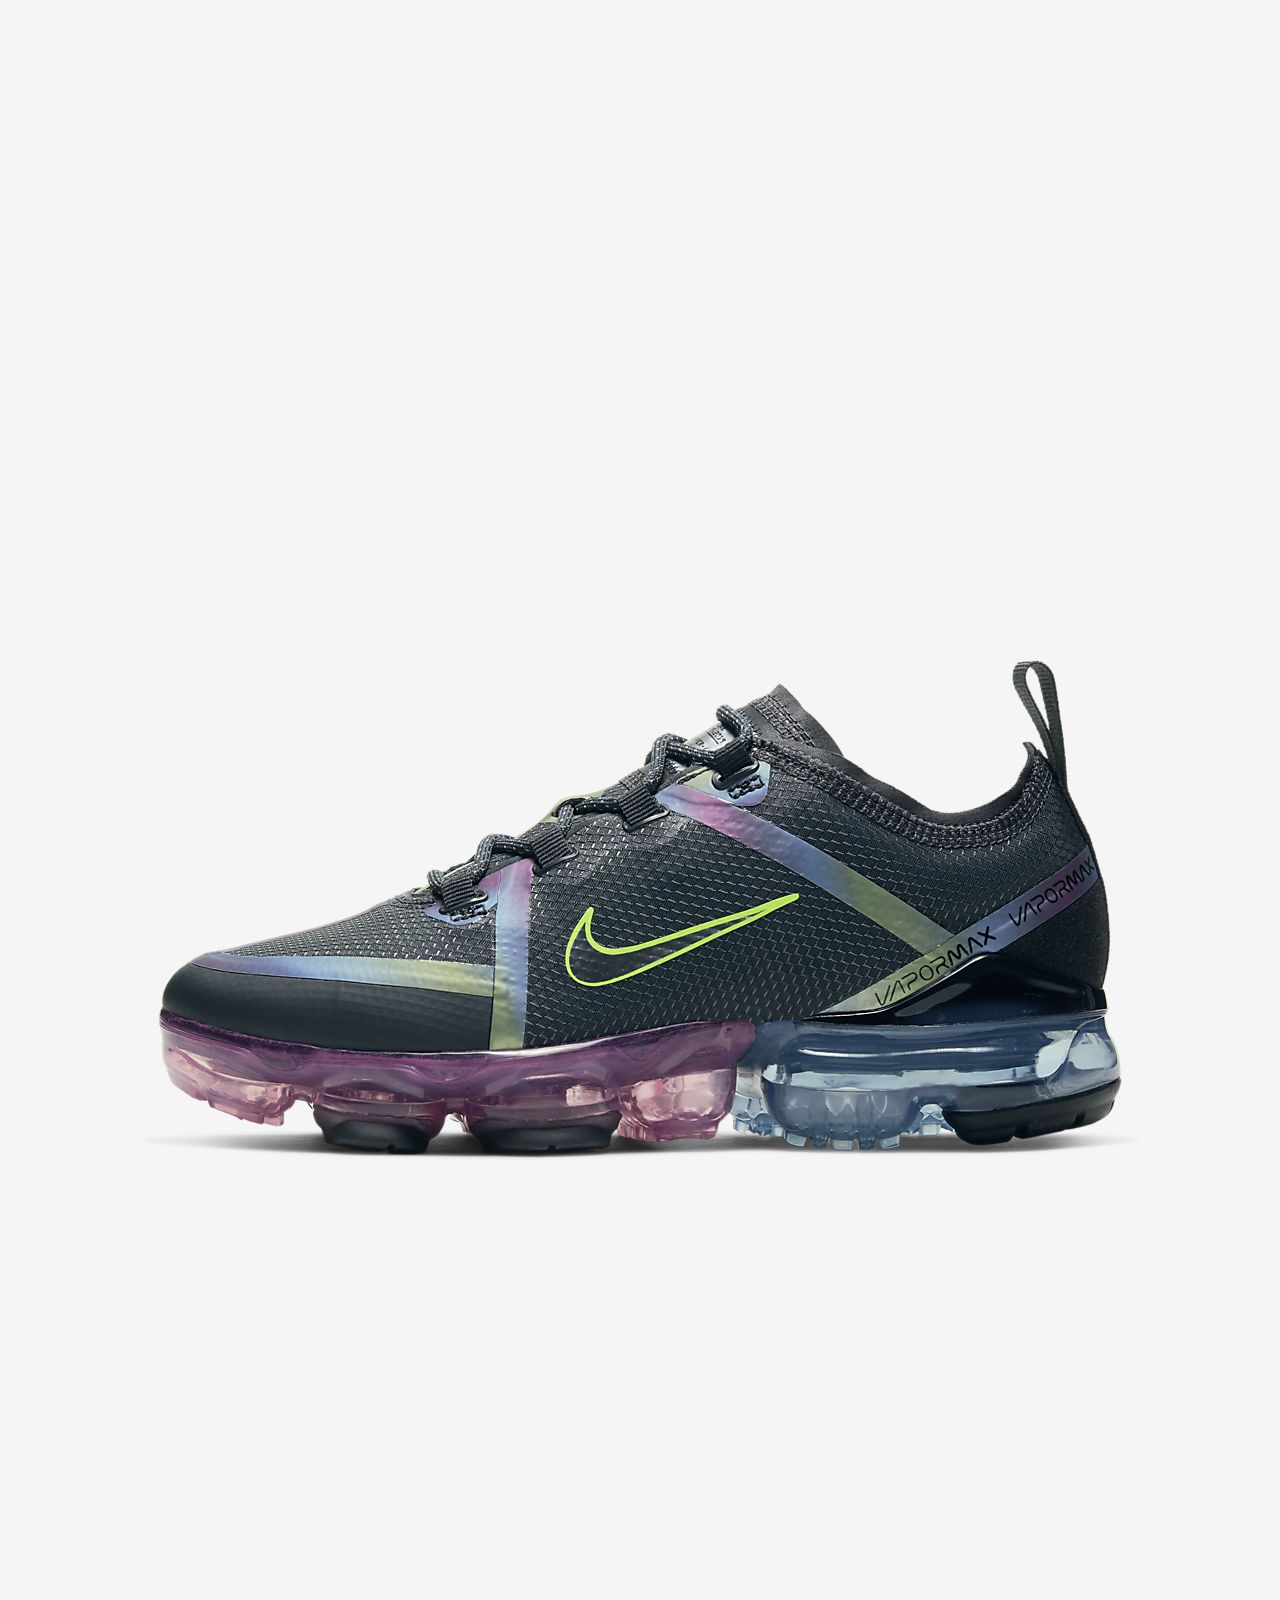 superior quality no sale tax buy online Nike Air VaporMax 2019 Big Kids' Shoe. Nike.com